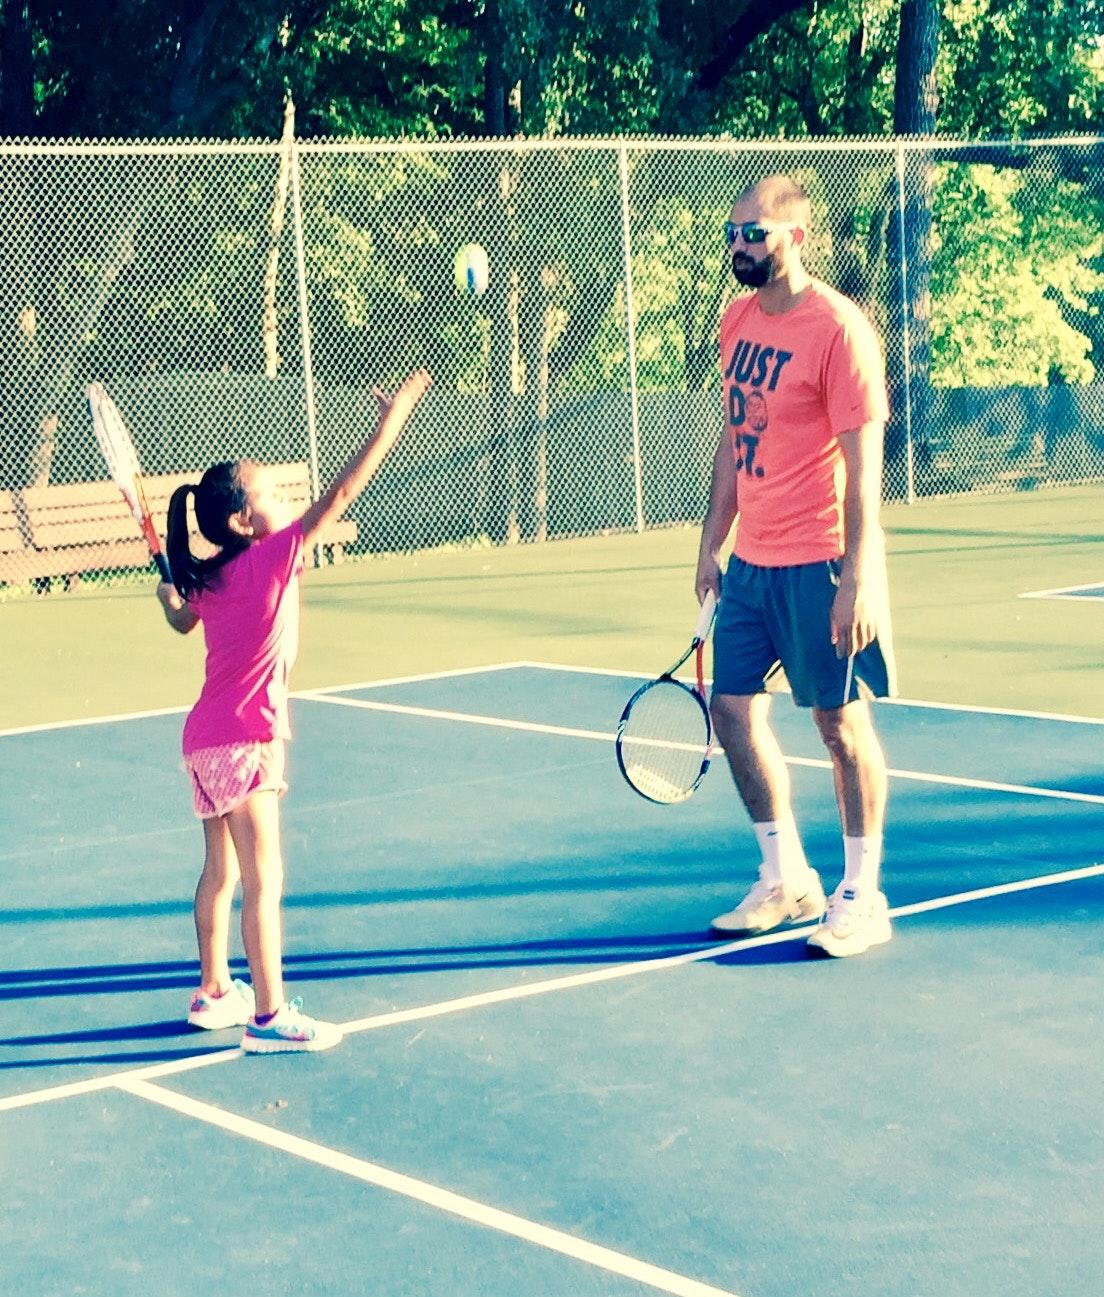 Arnaud G. teaches tennis lessons in San Antonio, TEXAS